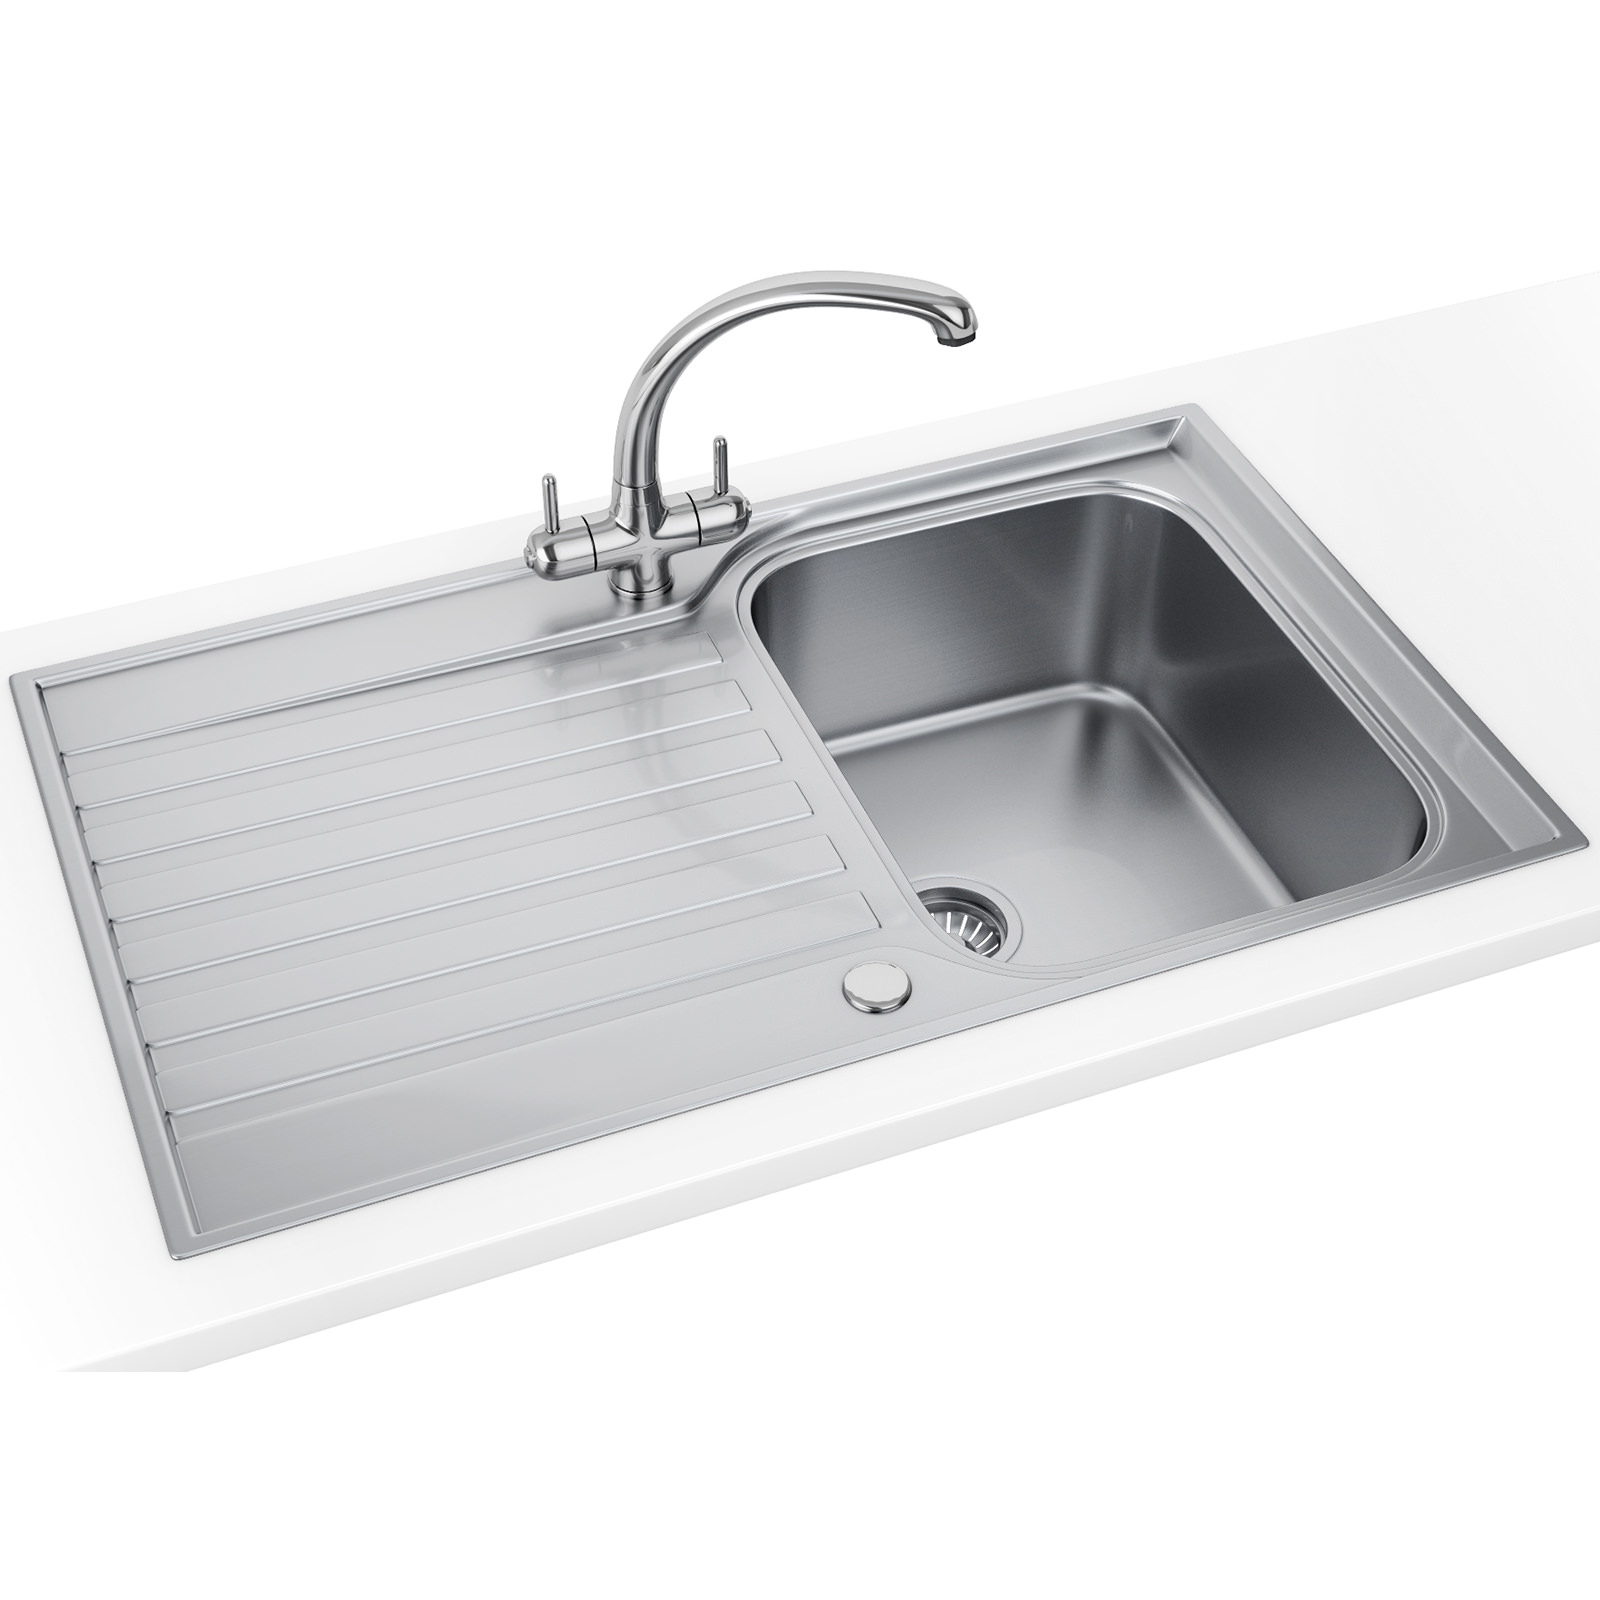 Sink Franke Stainless : Franke Ascona ASX 611-860 Stainless Steel 1.0 Bowl Inset Sink 101 ...